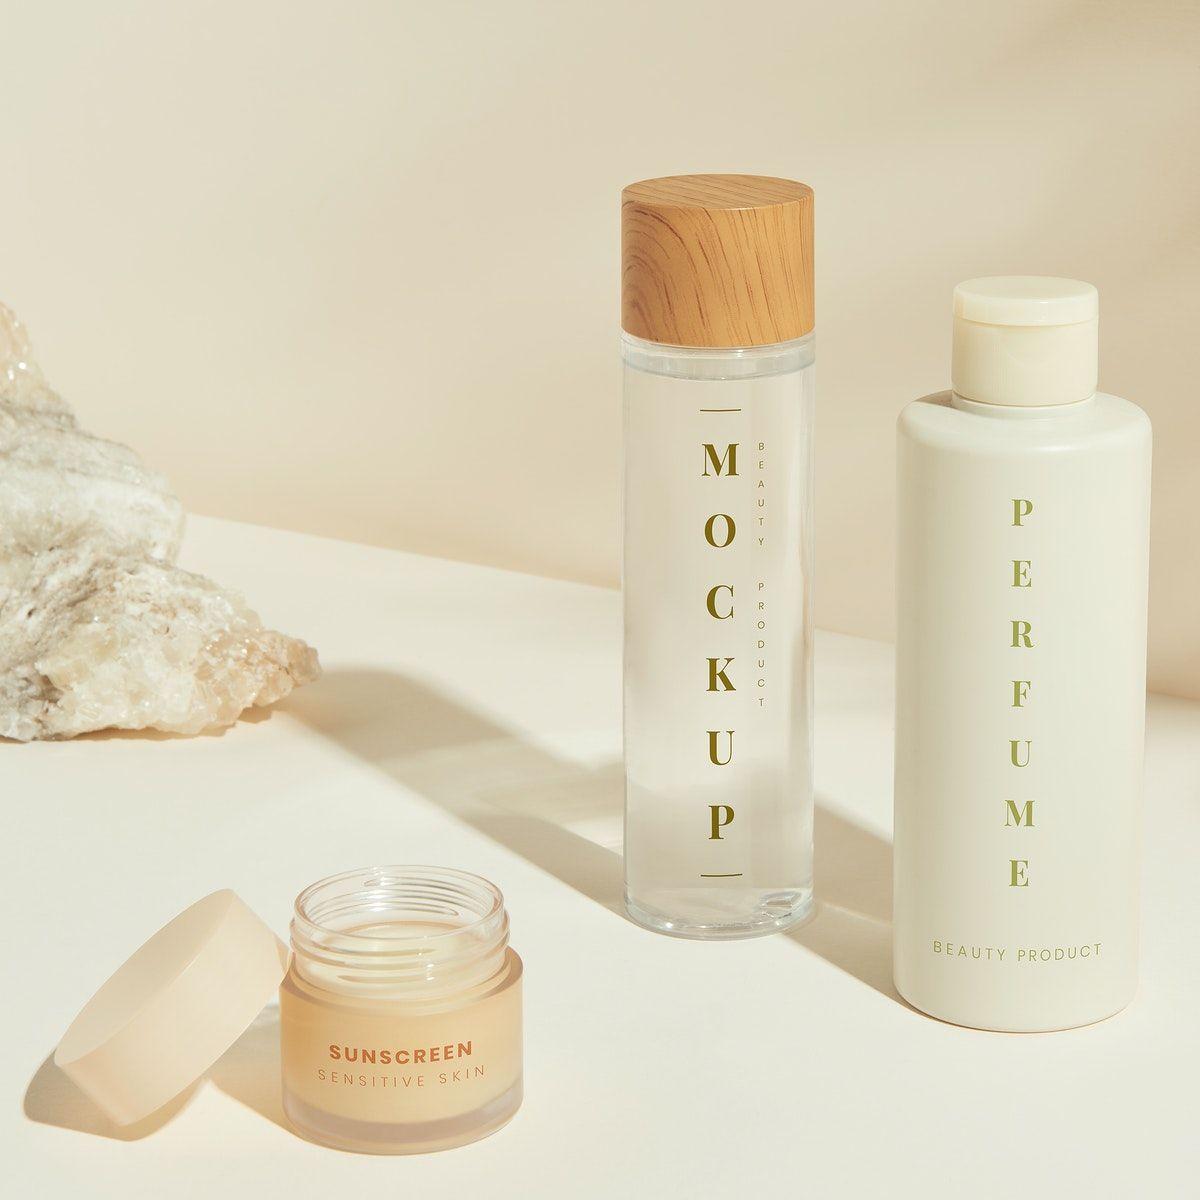 Download Premium Psd Of Set Of Skin Care Package Mockup Design 2365329 Cosmetics Mockup Cosmetic Packaging Design Skin Care Packaging